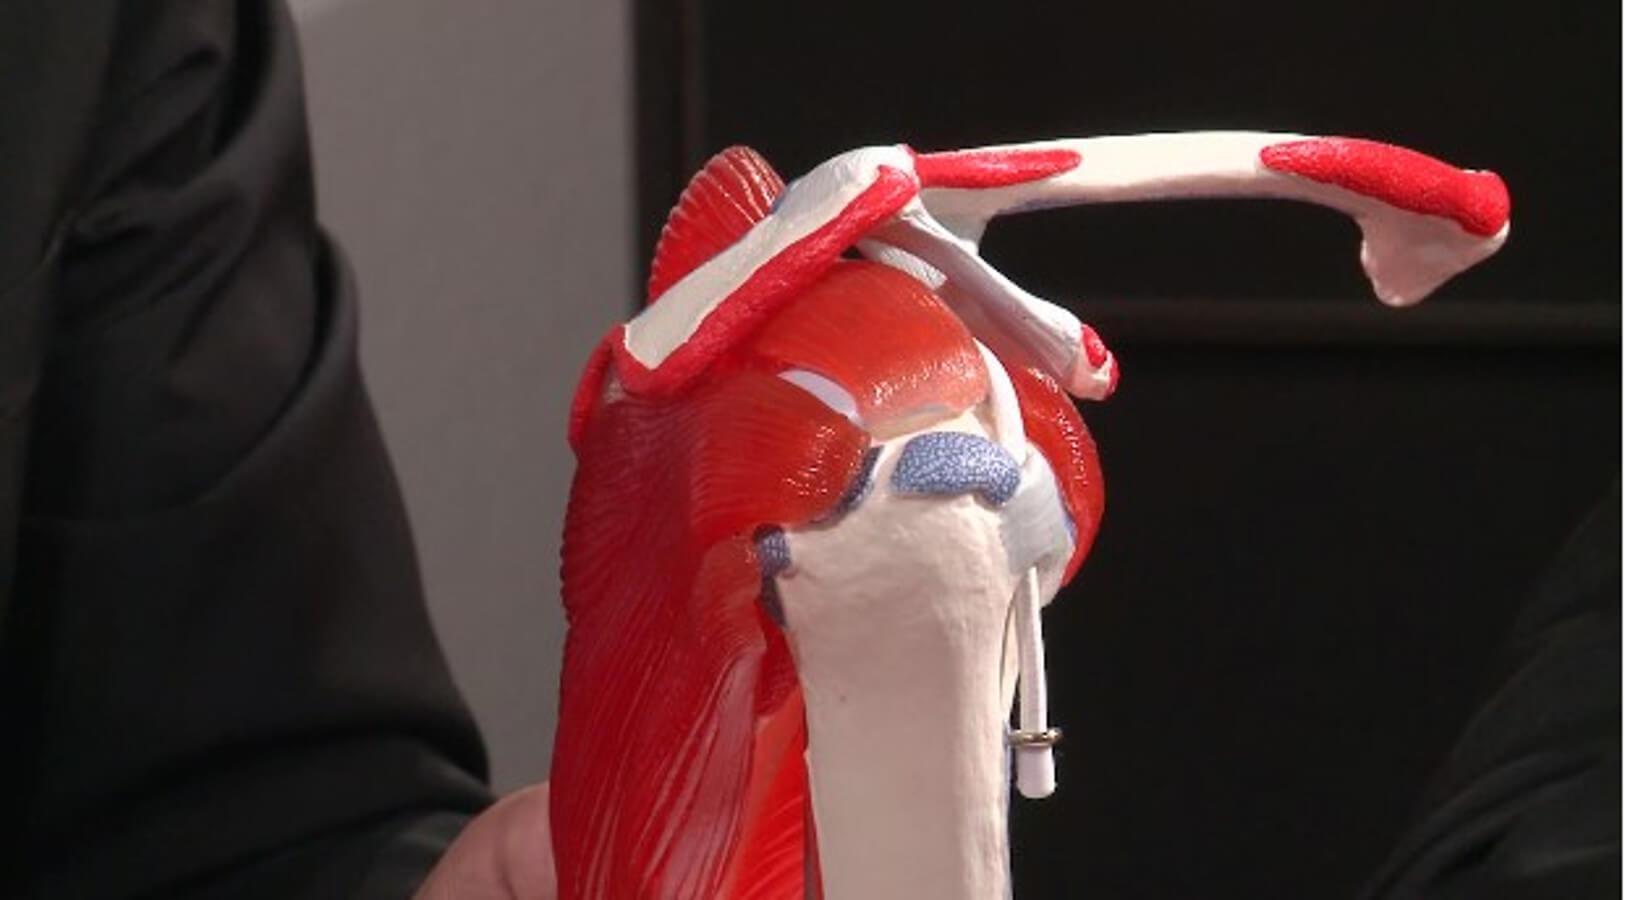 Sehnenriss in der Schulter - wann operieren?